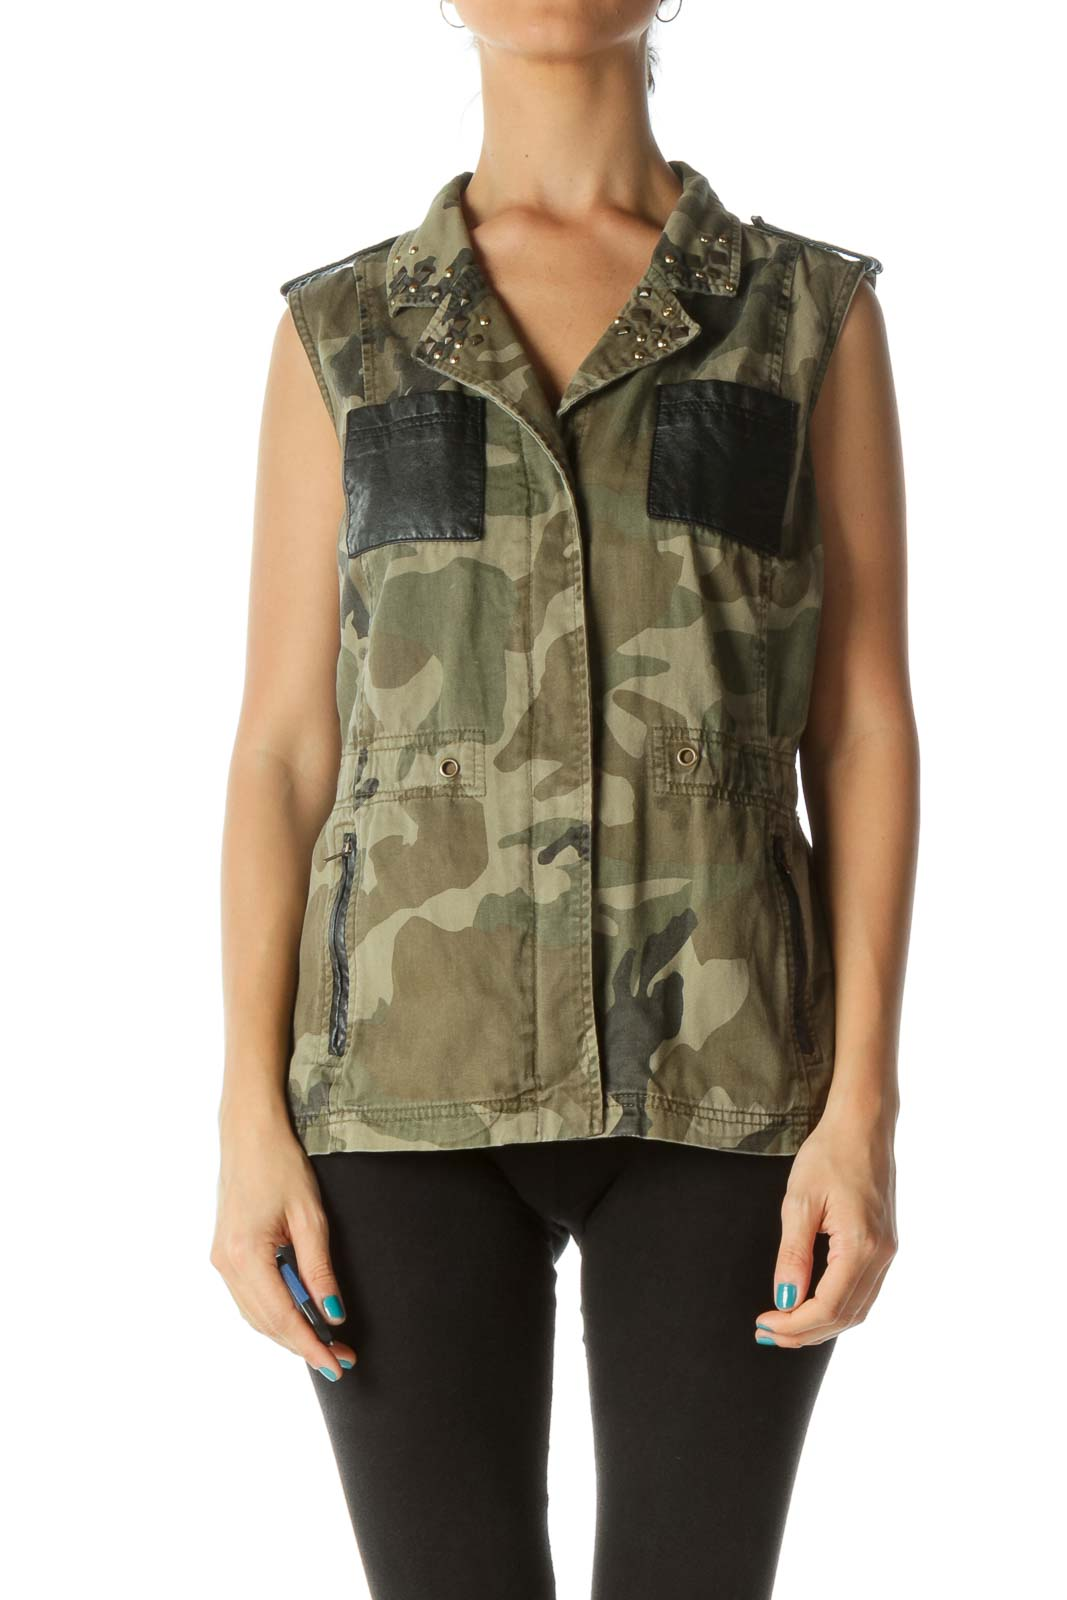 Green Black Camo Print Studded Vest Front